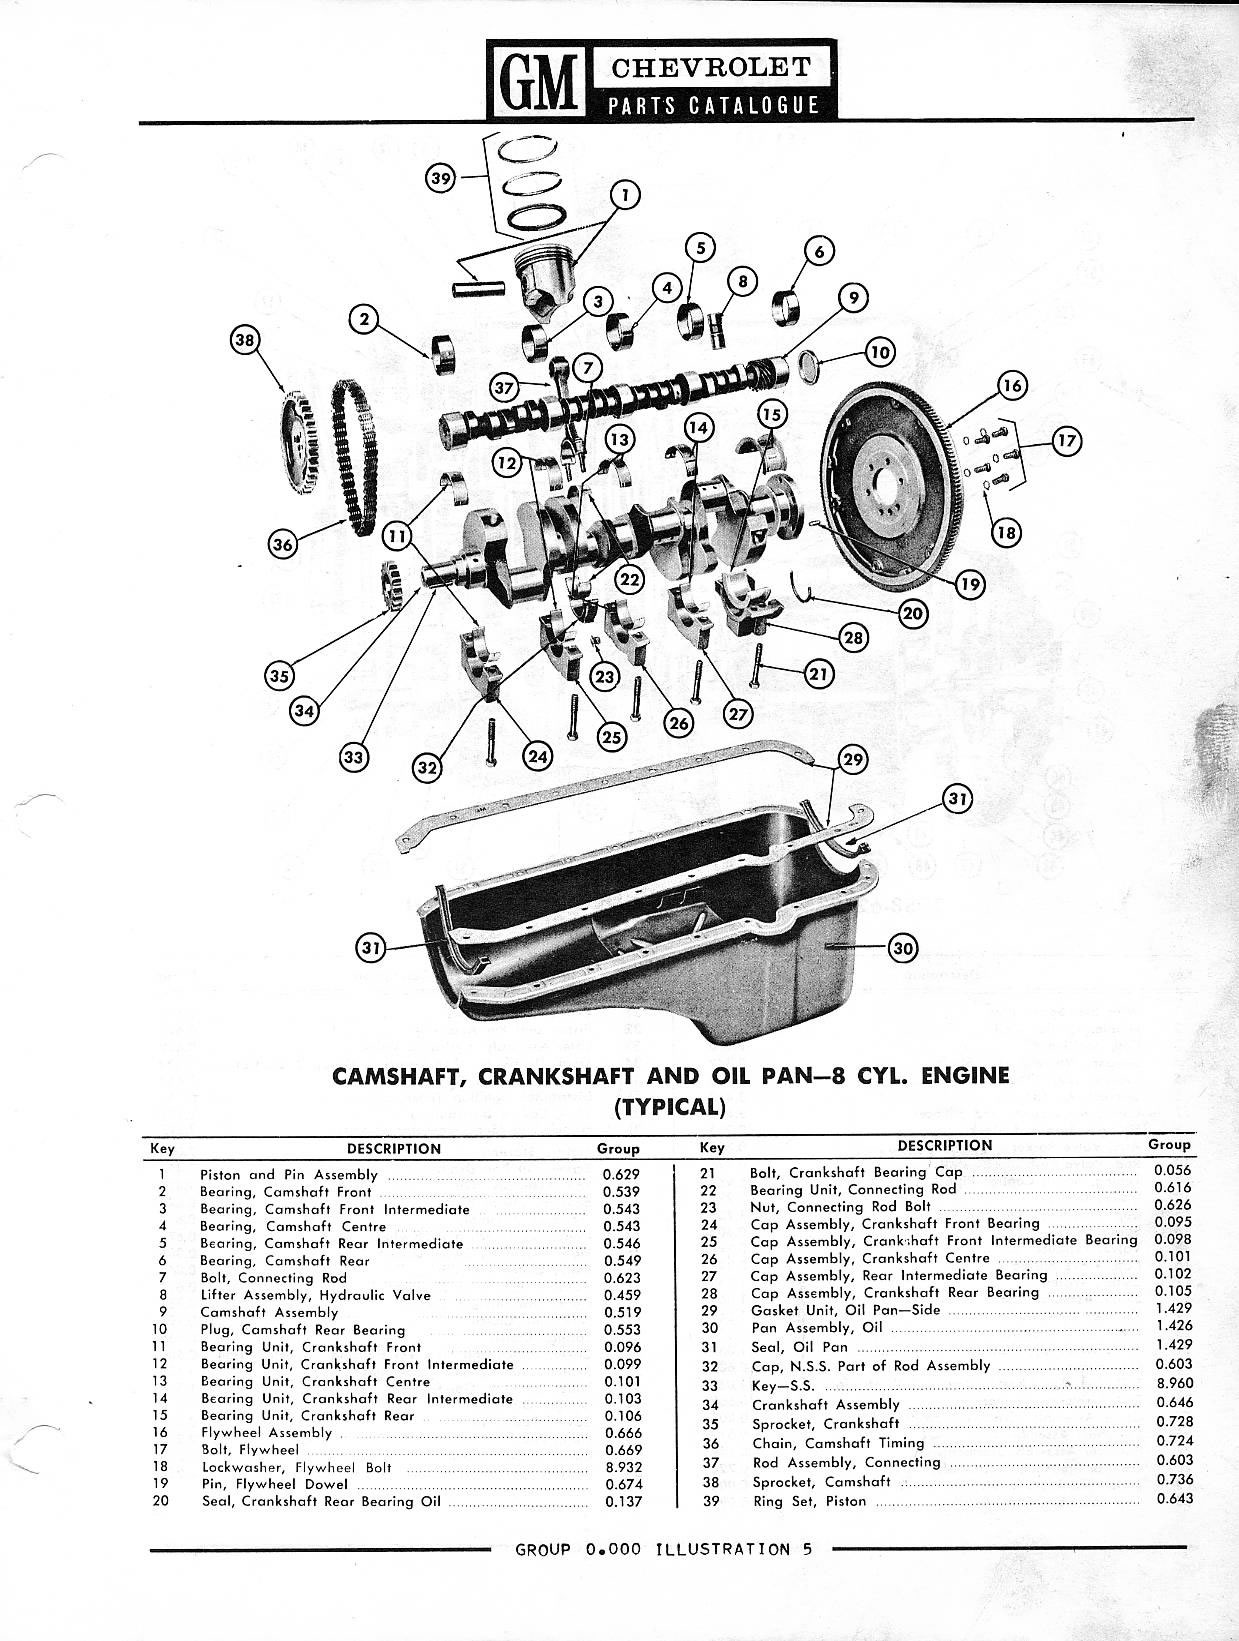 1958-1968 Chevrolet Parts Catalog / Image120.jpg